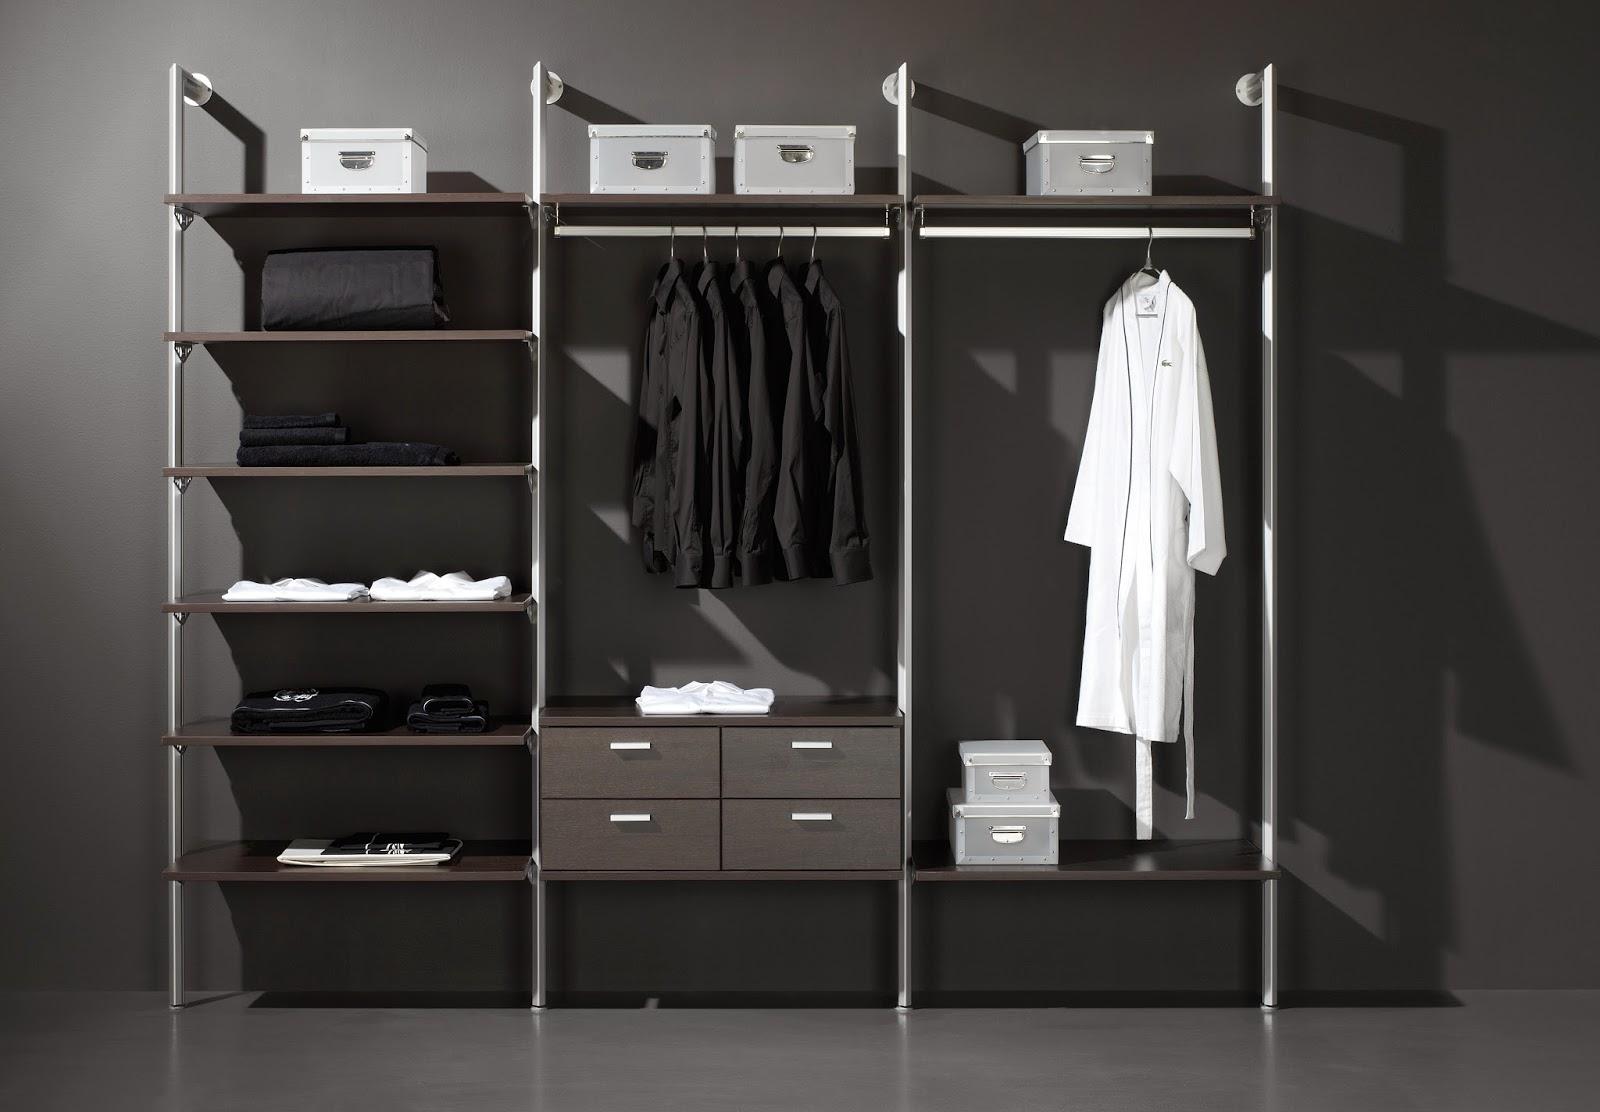 Muebles iturbe spot system un concepto original e for Muebles de oficina 3d model